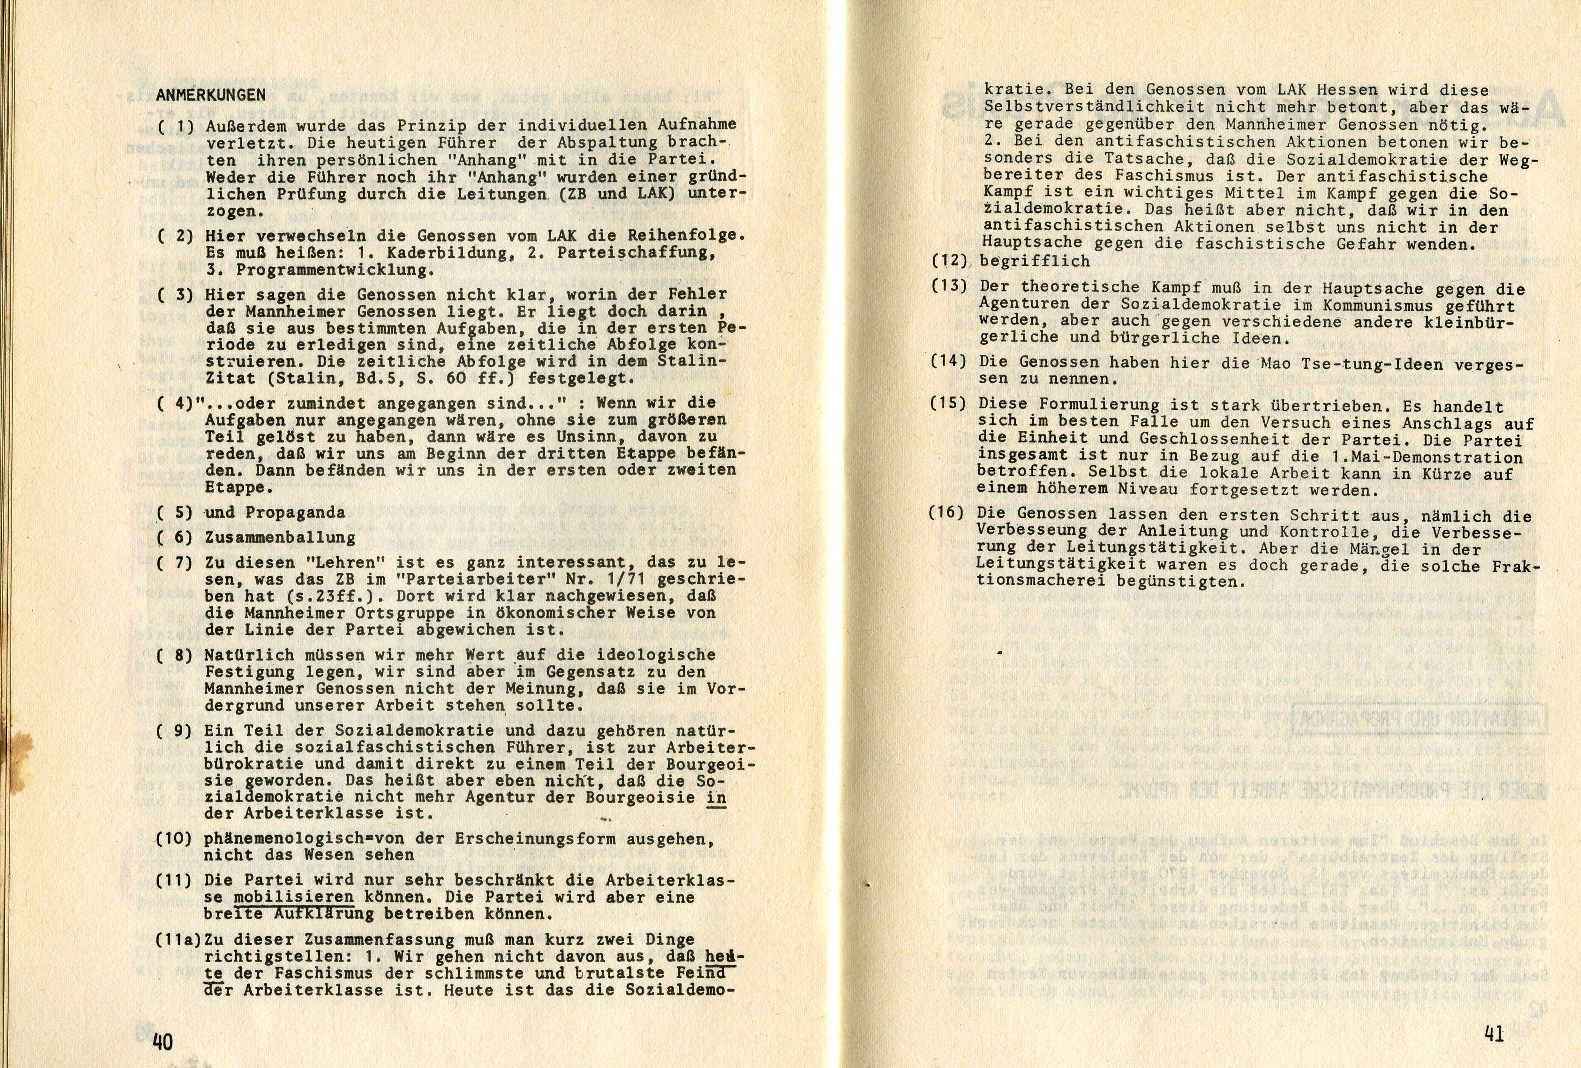 ZB_Parteiarbeiter_1971_05_22